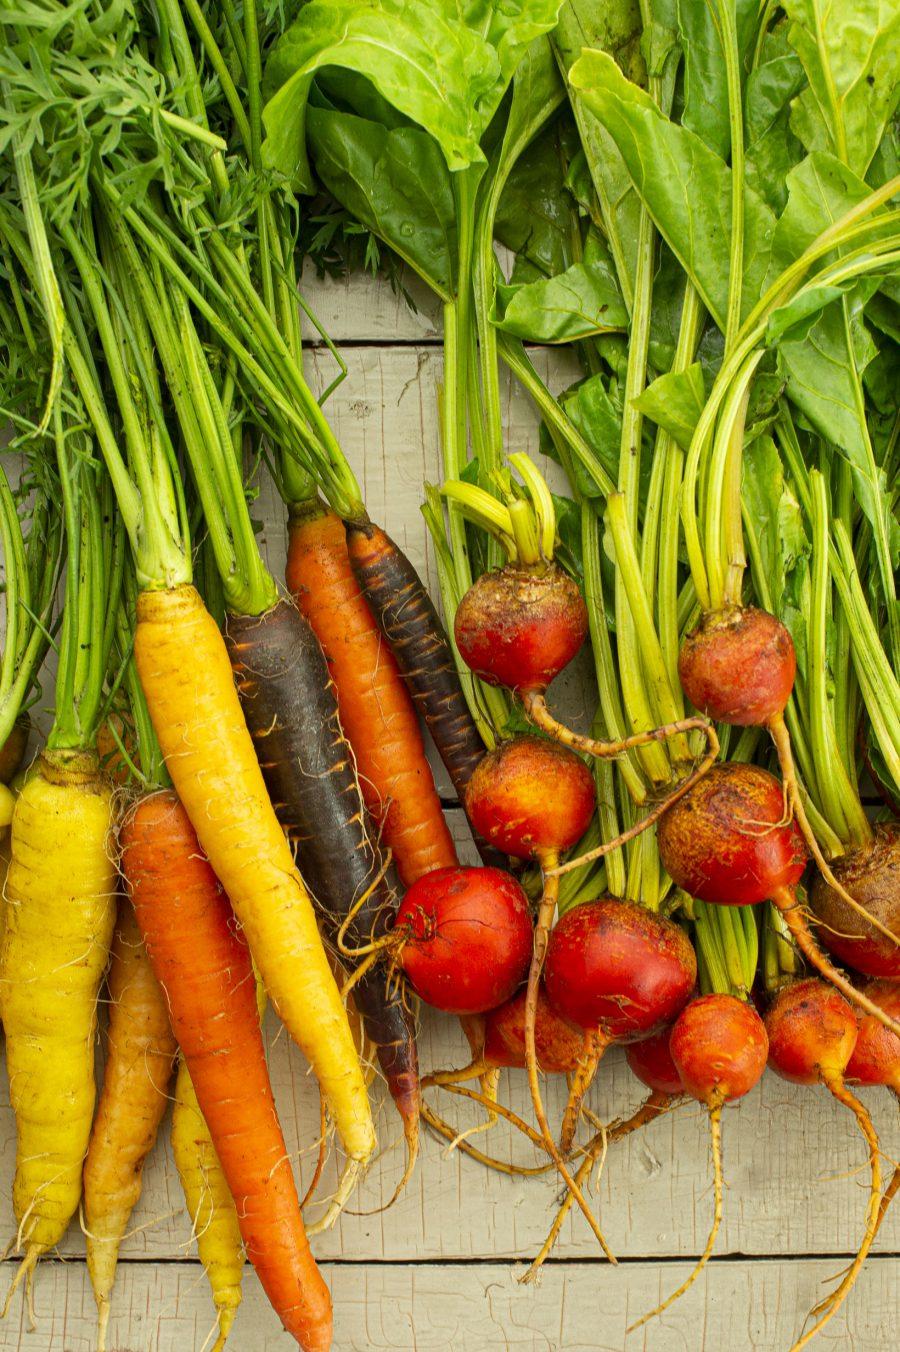 Luttons contre le gaspillage alimentaire